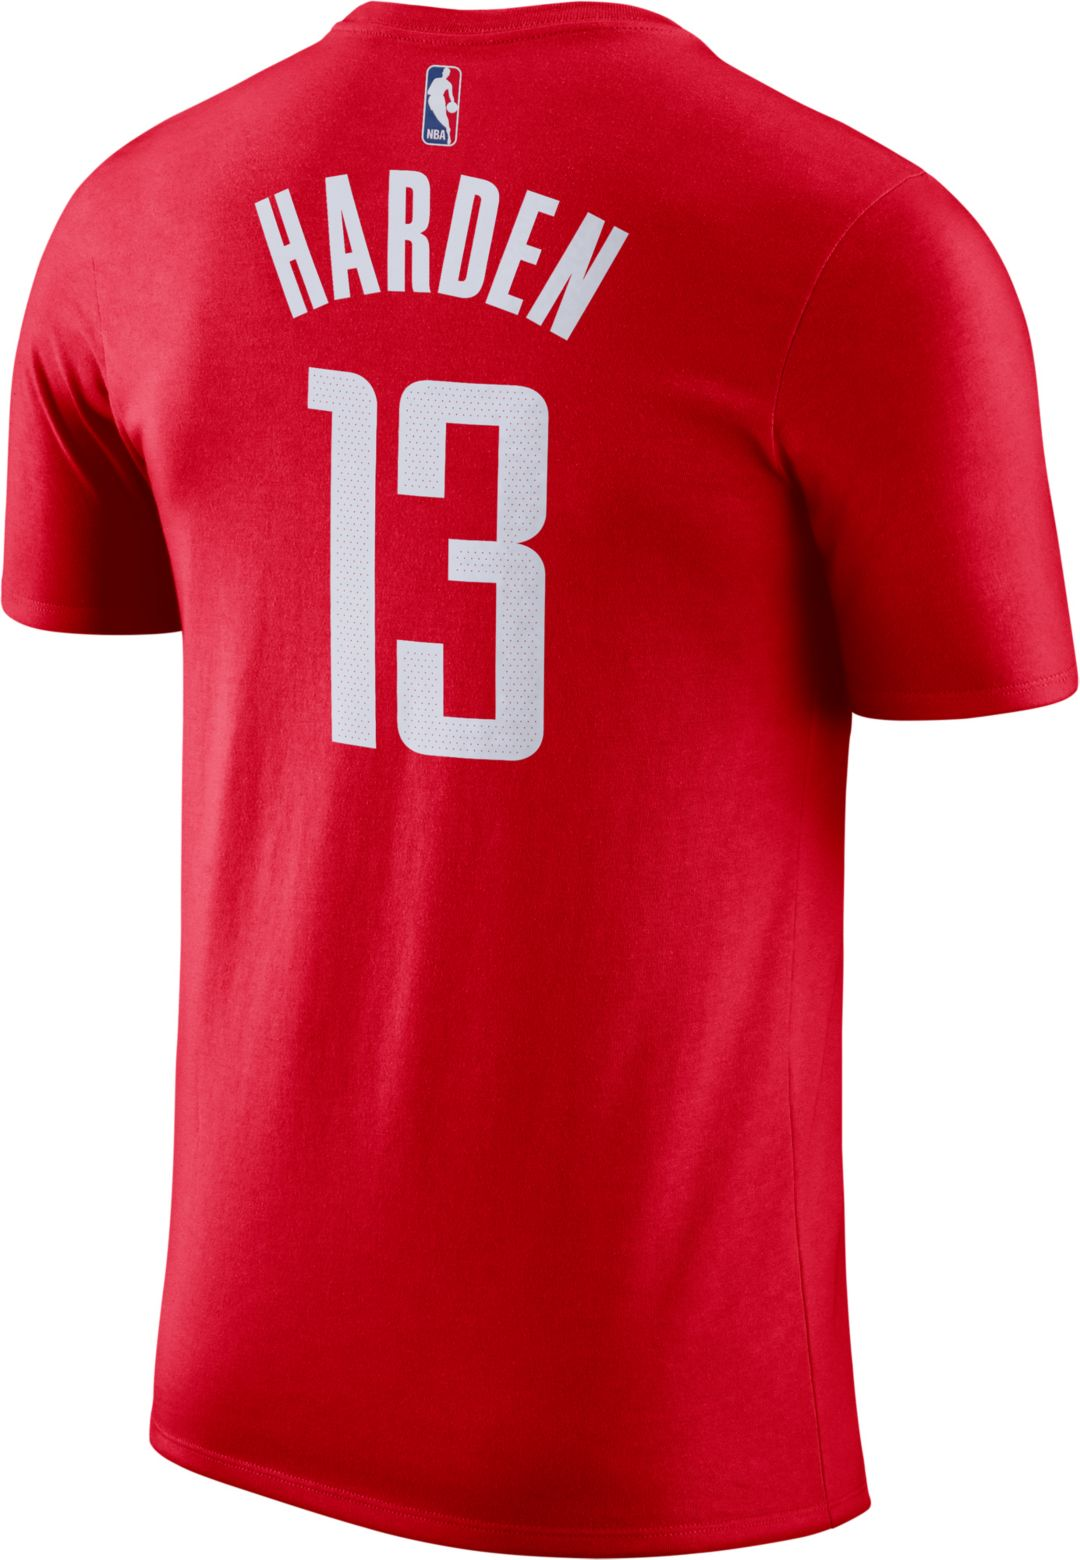 new styles 6c78b 3f4a3 Nike Men's Houston Rockets James Harden #13 Dri-FIT Red T-Shirt